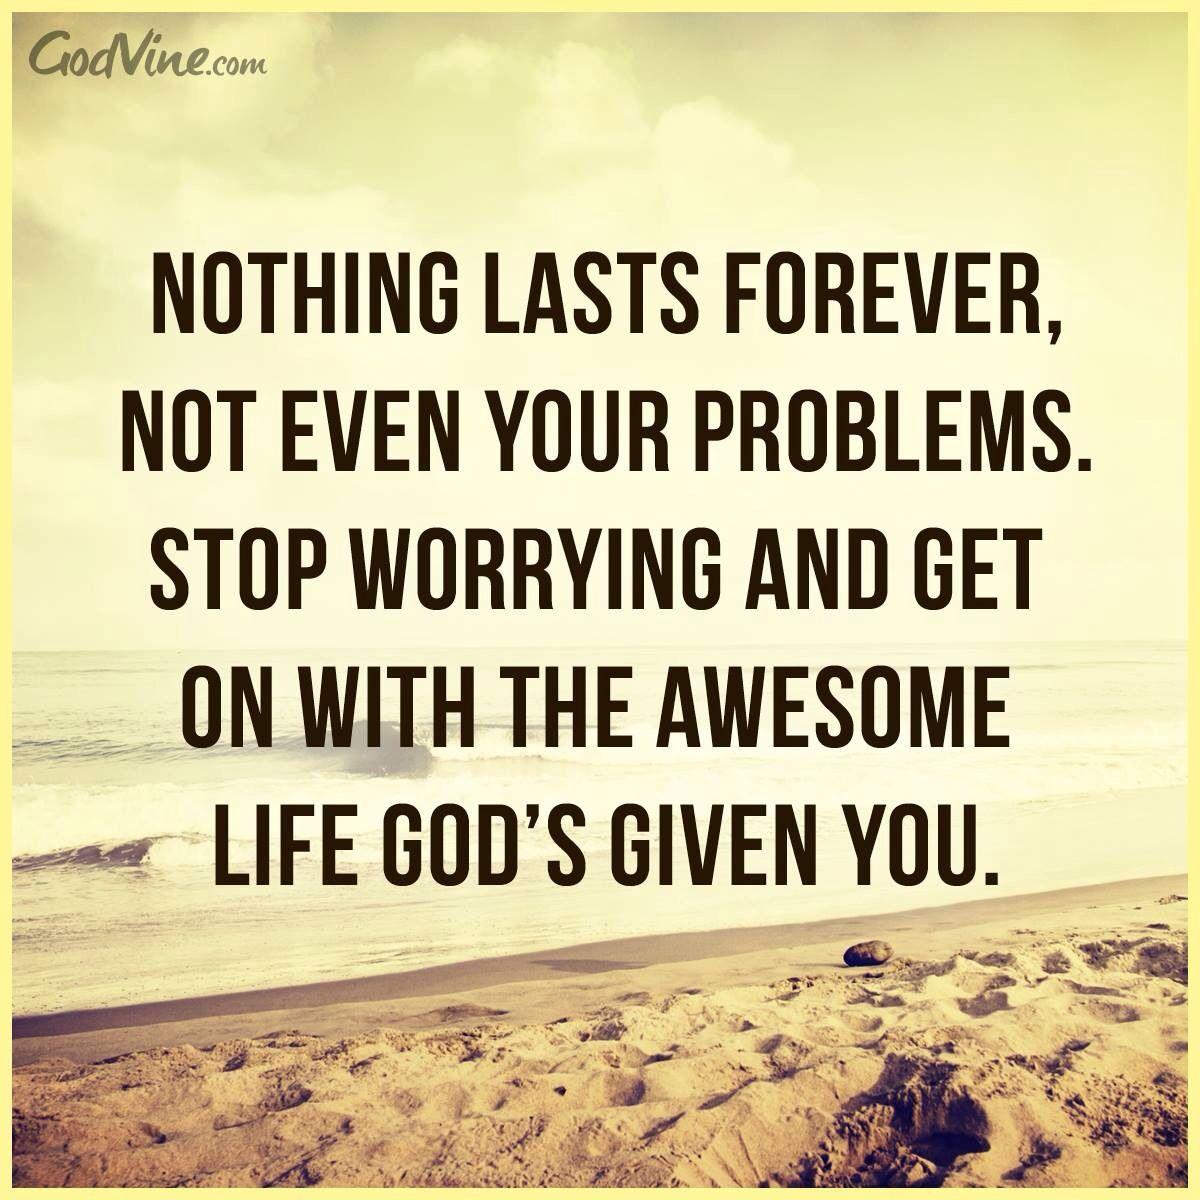 Christian Inspirational Quotes Life Awesome Life Godthank U  ▷Wow◁  Pinterest